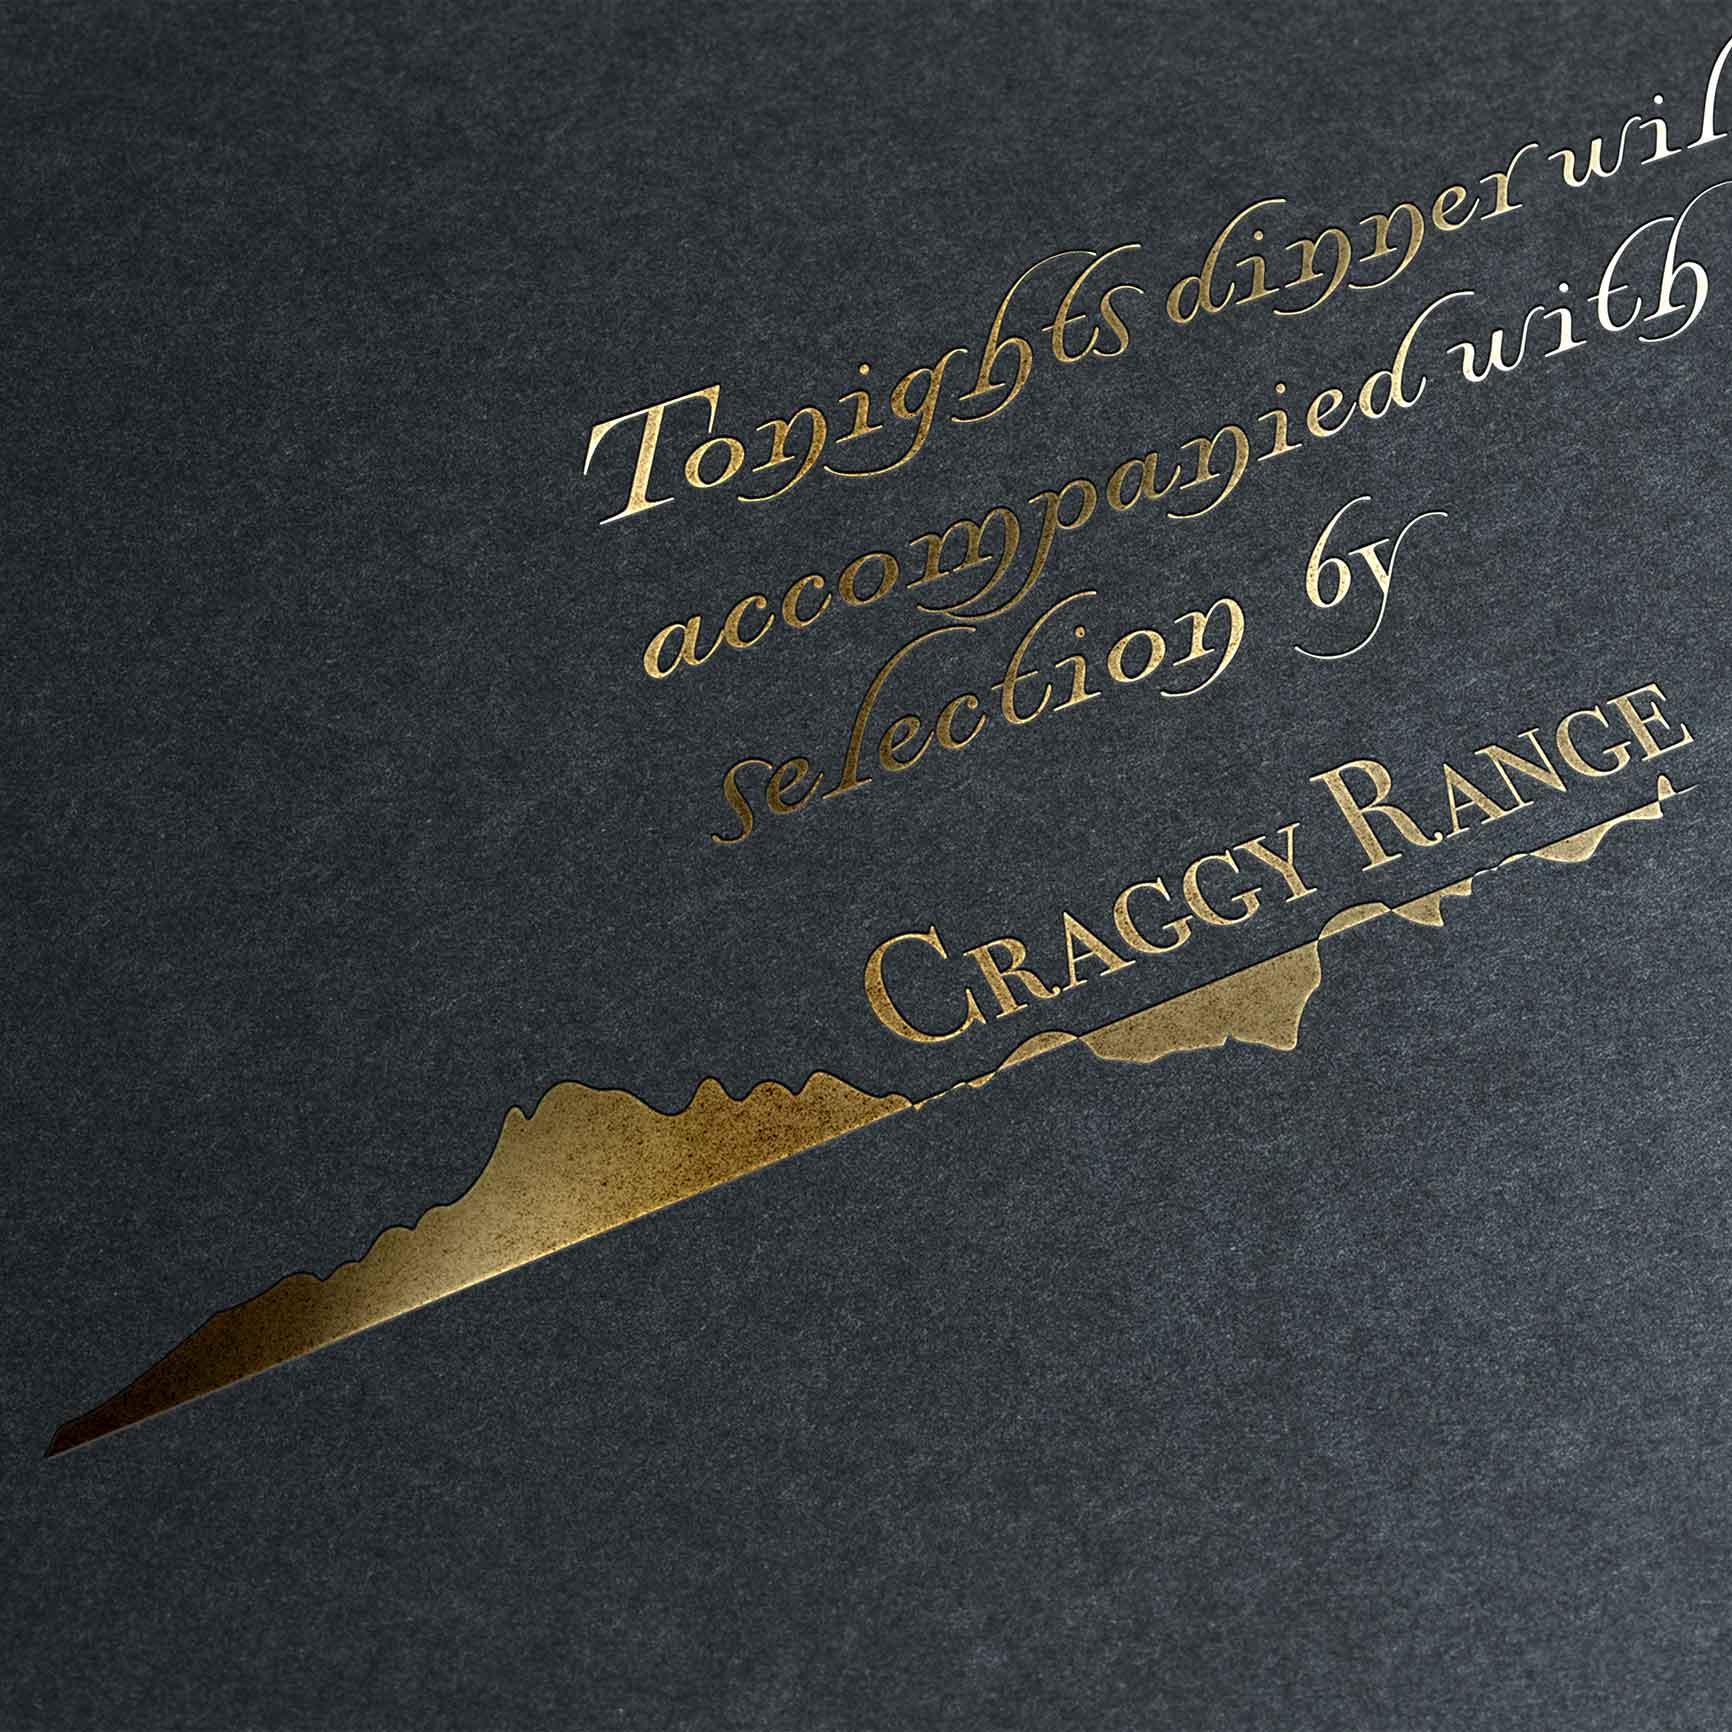 Craggy Range Re - Brand